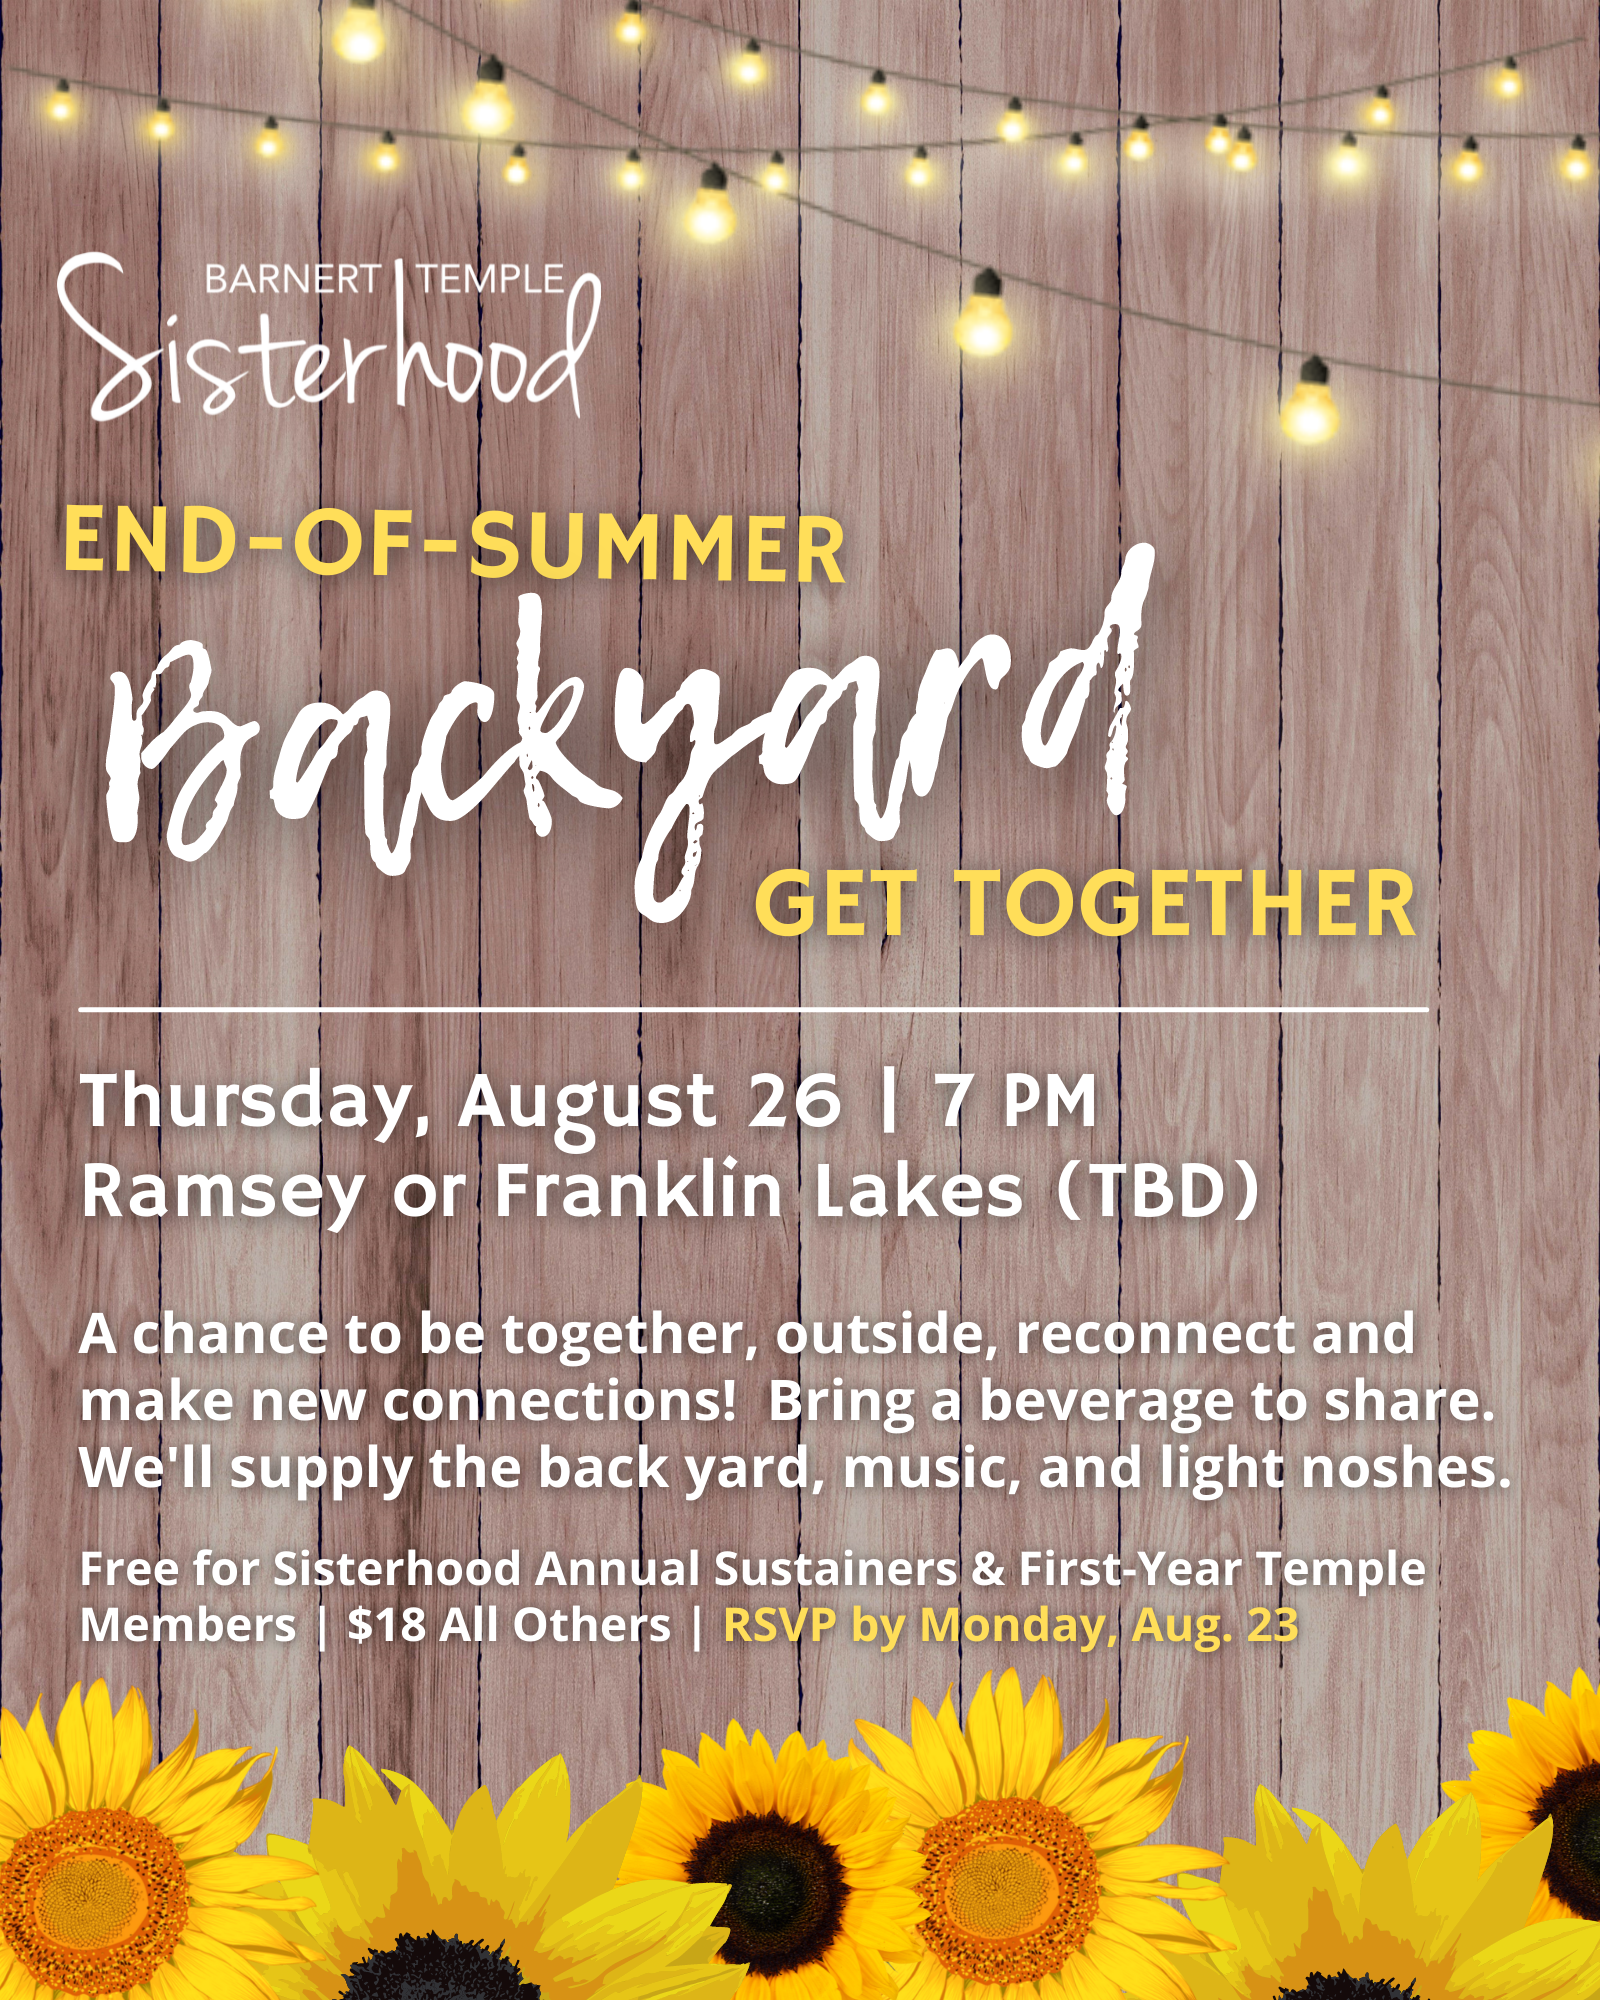 Sisterhood End of Summer Backyard Get Together Ad